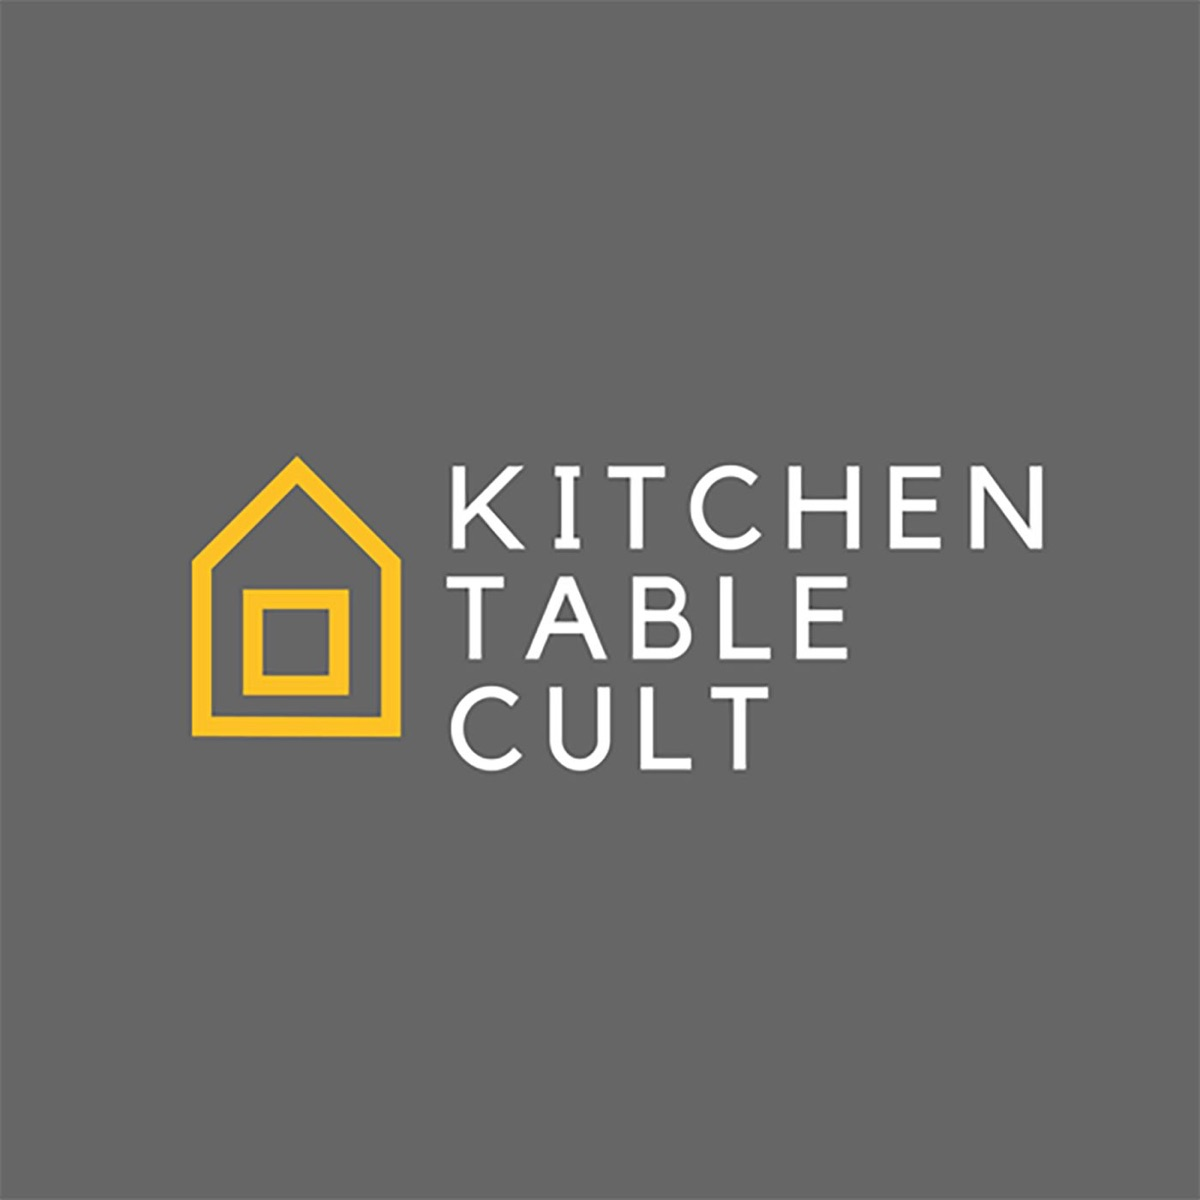 Kitchen Table Cult Pod – Podcast – Podtail